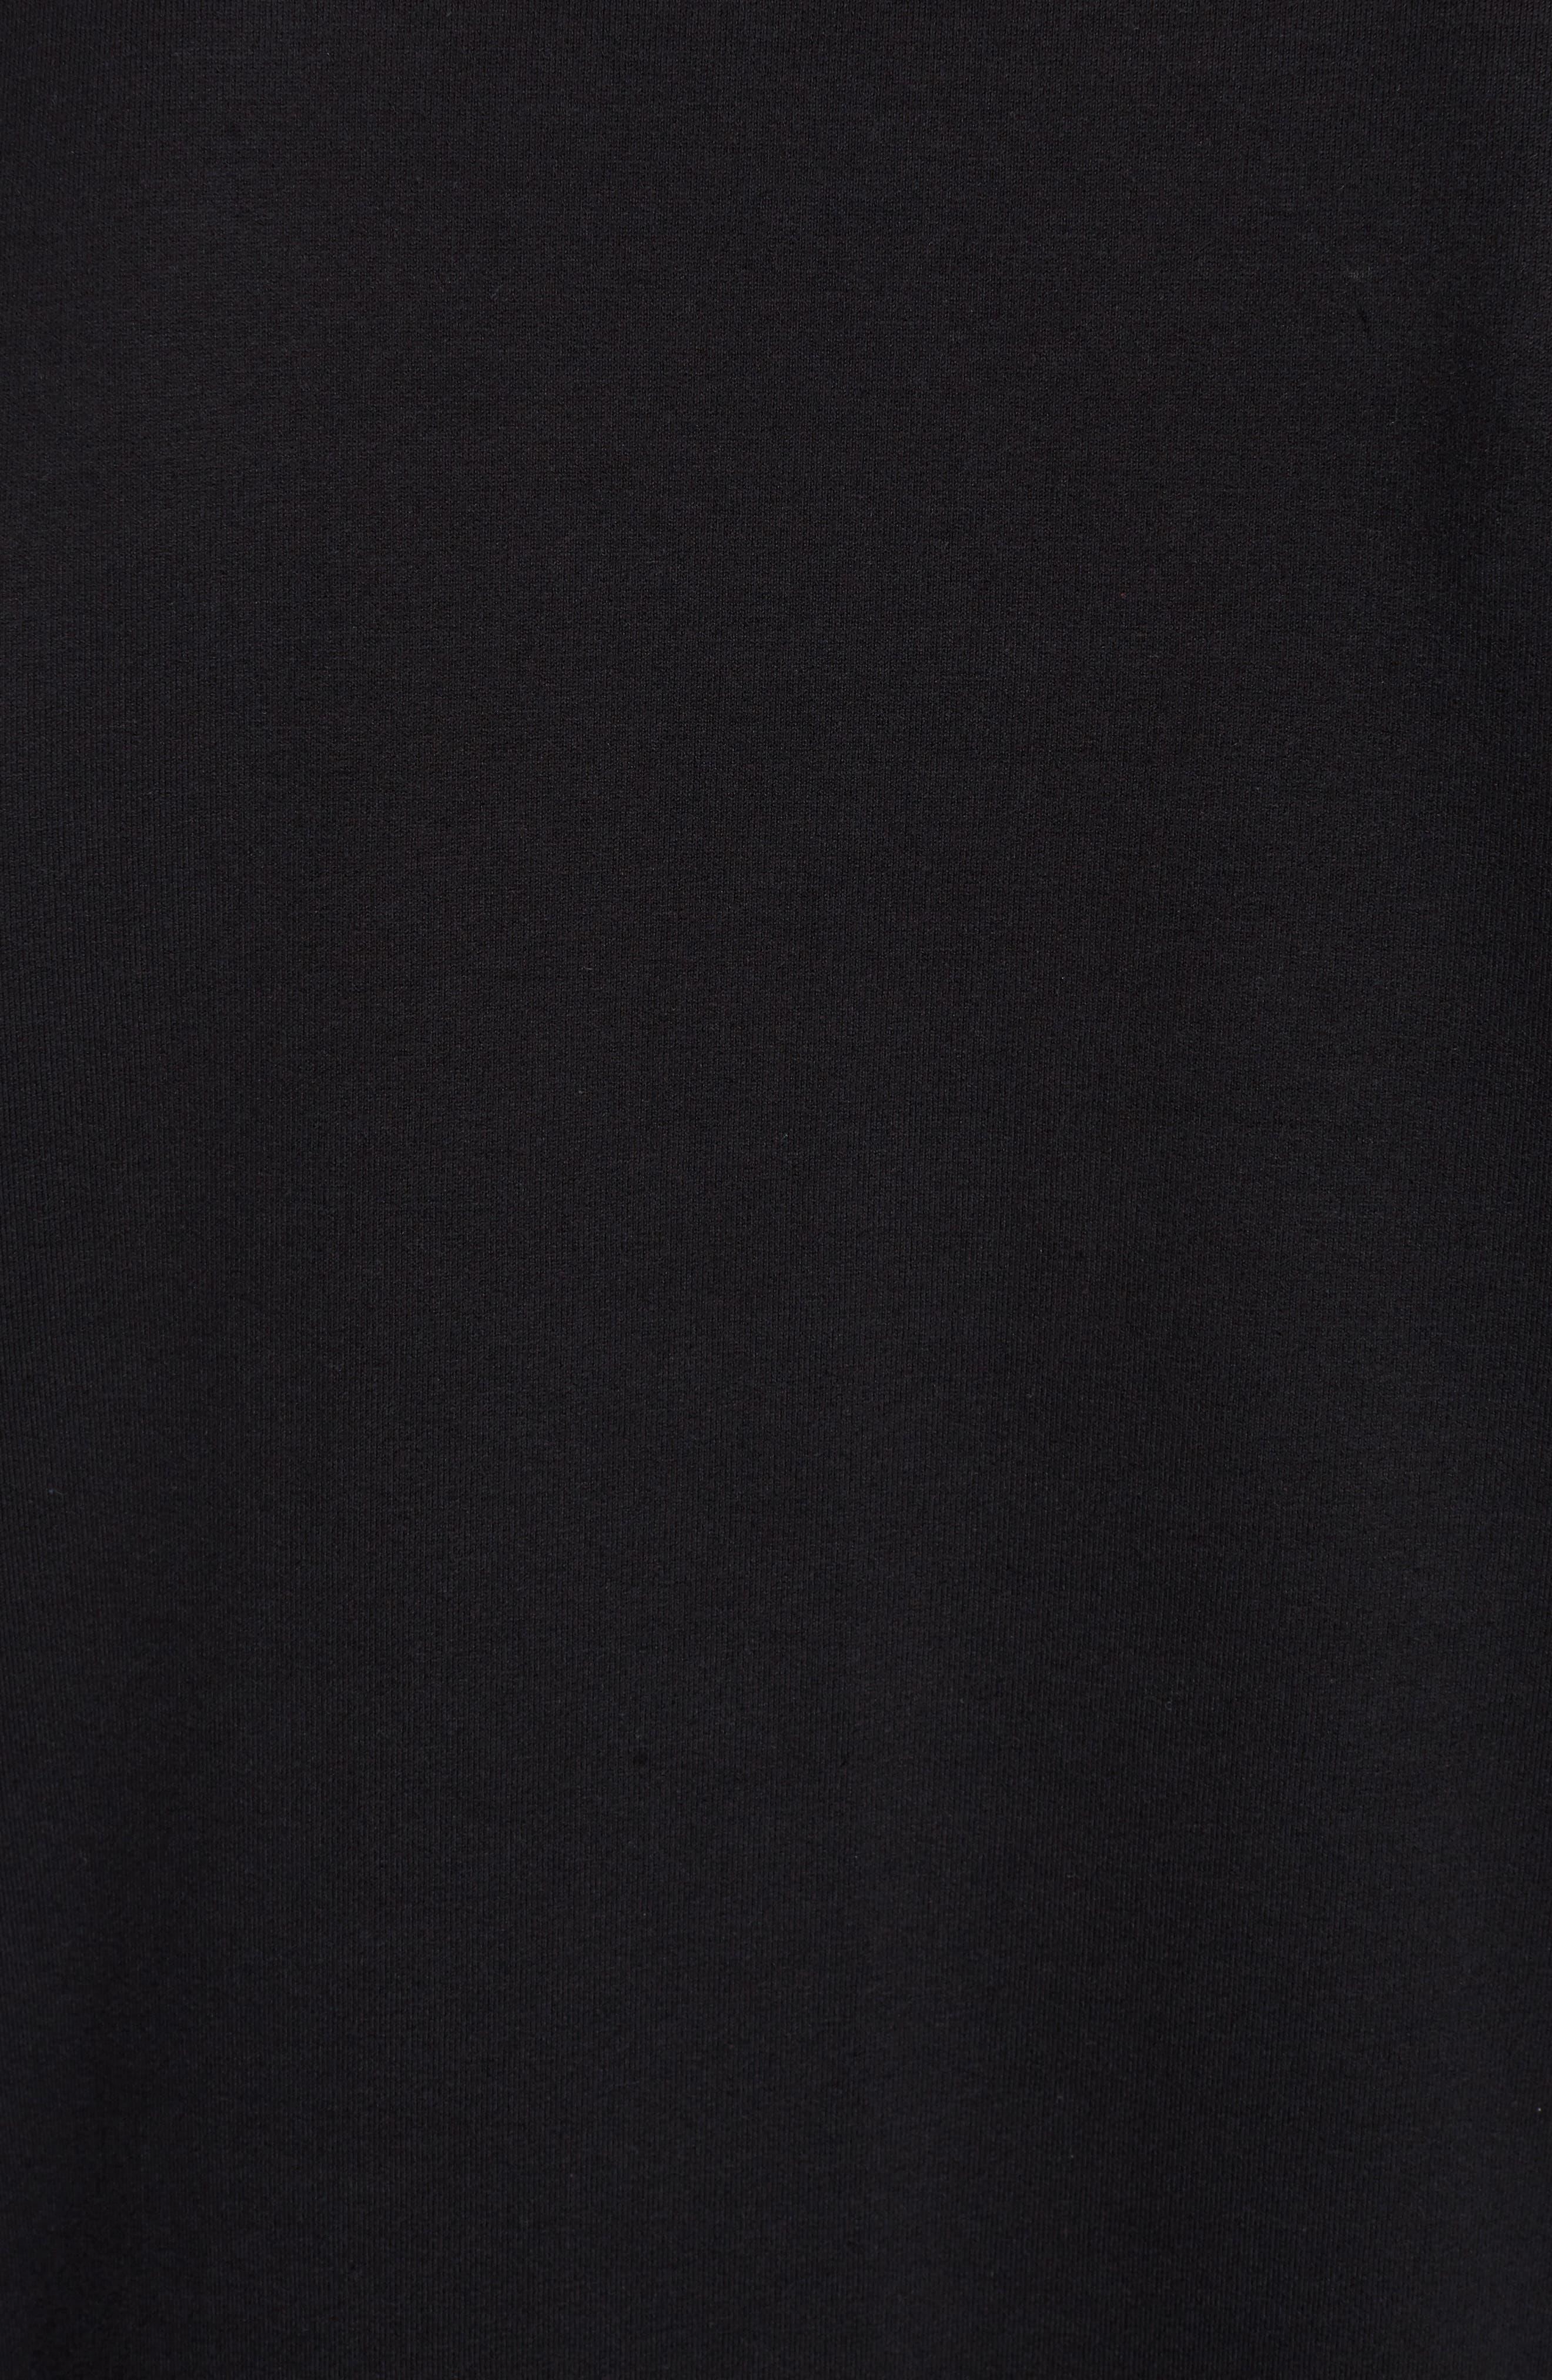 Embroidered Logo Sweatshirt,                             Alternate thumbnail 5, color,                             Black